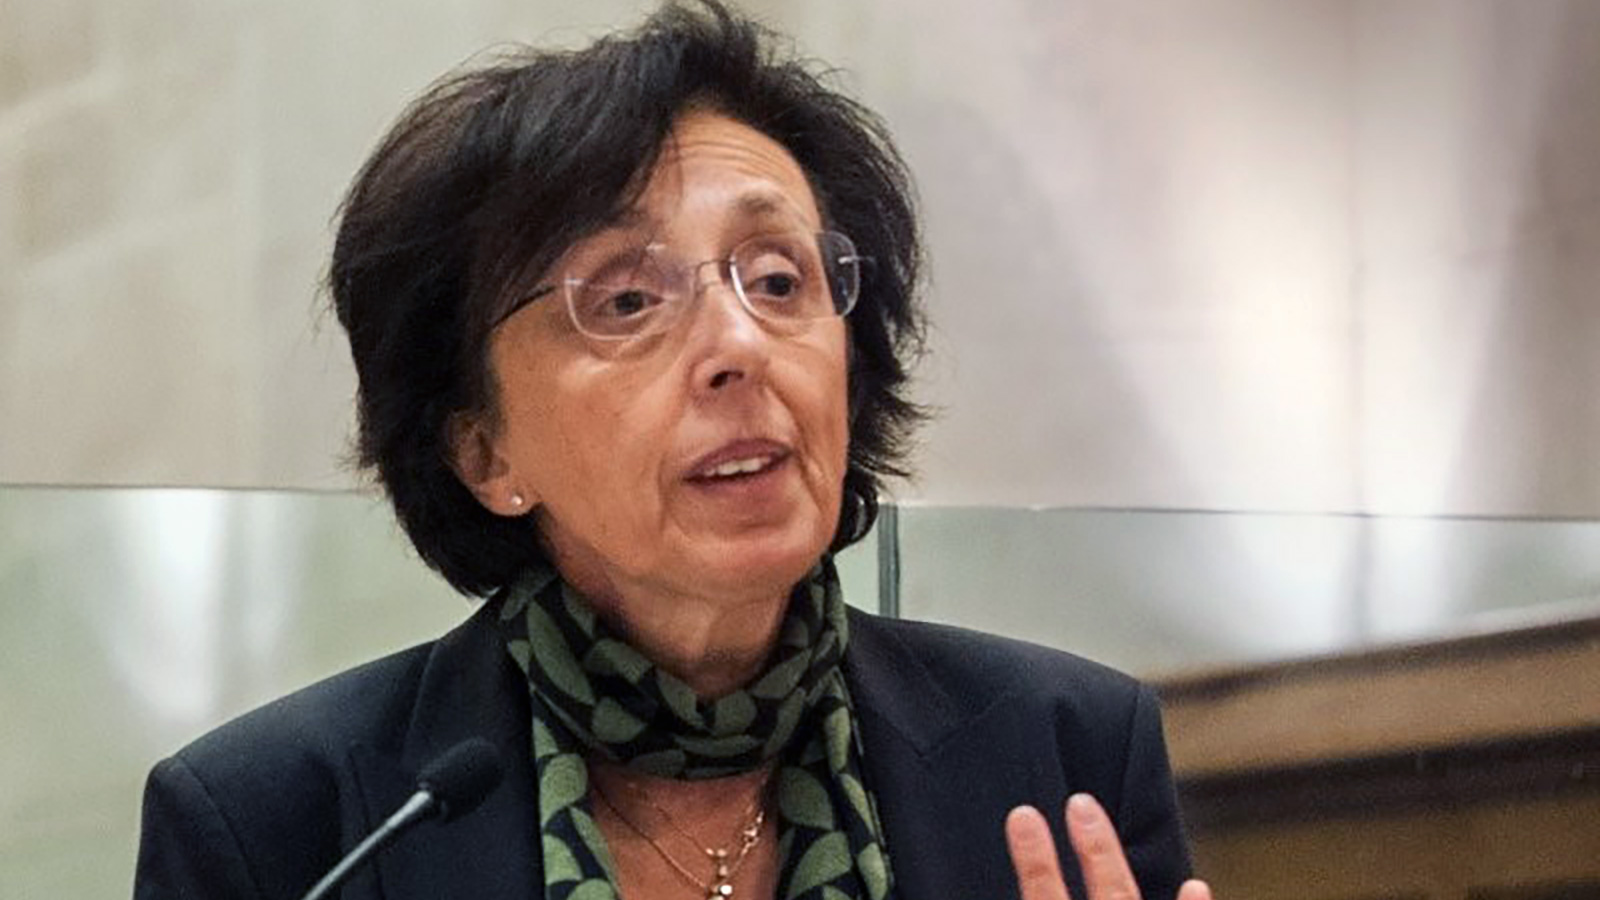 MICCoM Director Giulia Galli (Image courtesy of UChicago.)